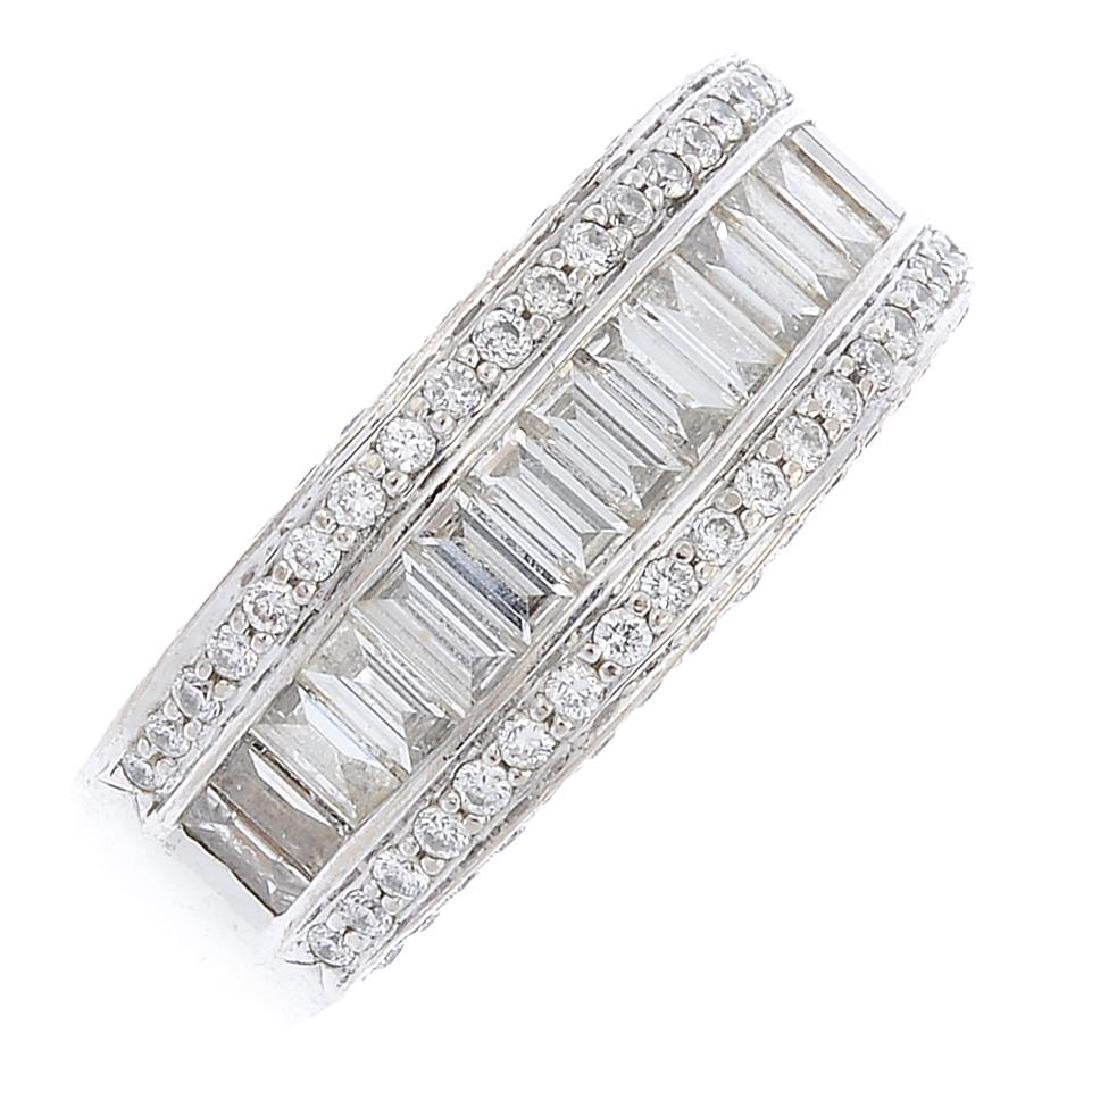 (21482) A diamond band ring. Designed as a baguette-cut